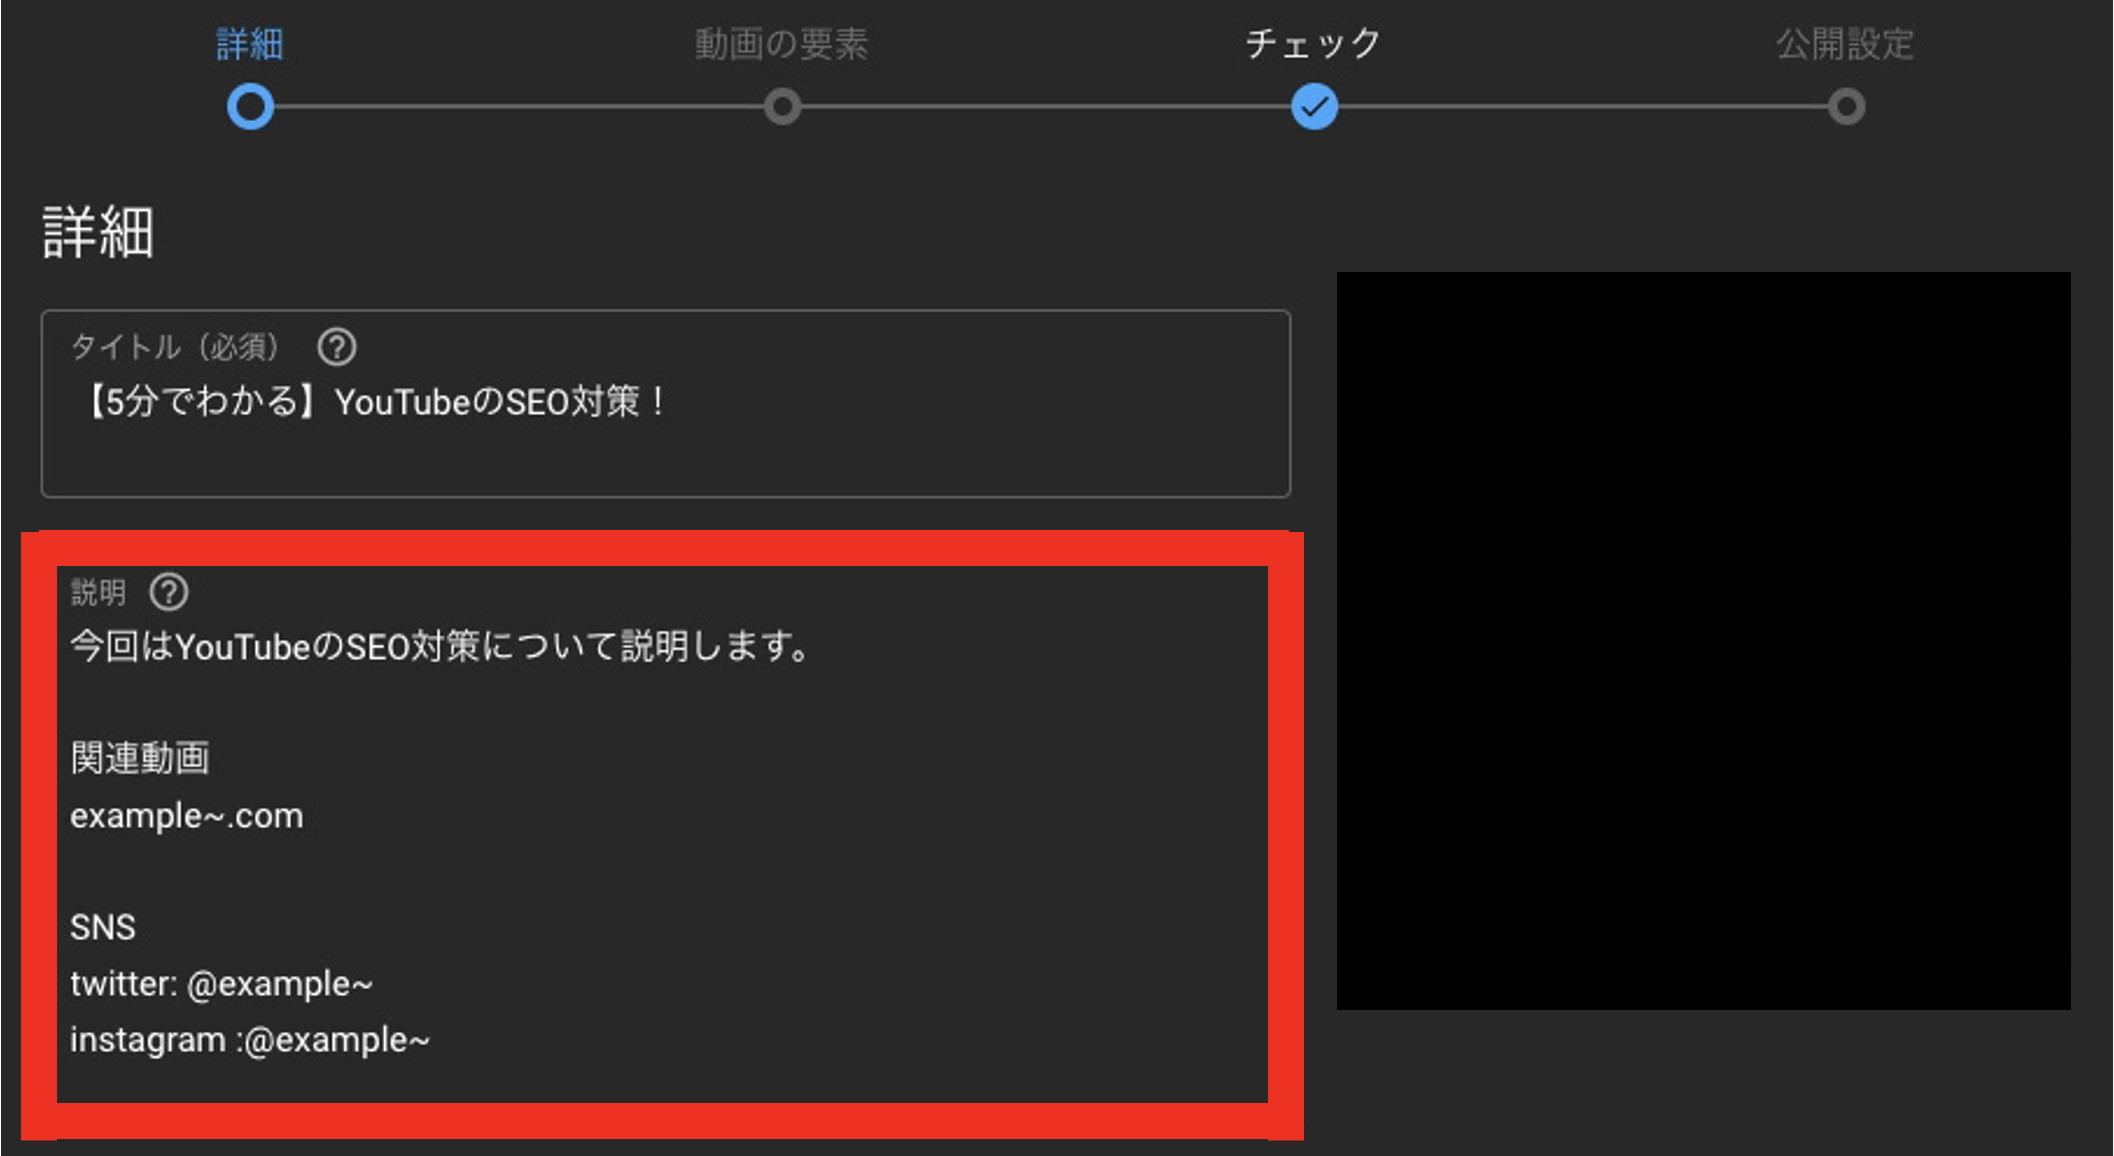 YouTube SEO 説明文